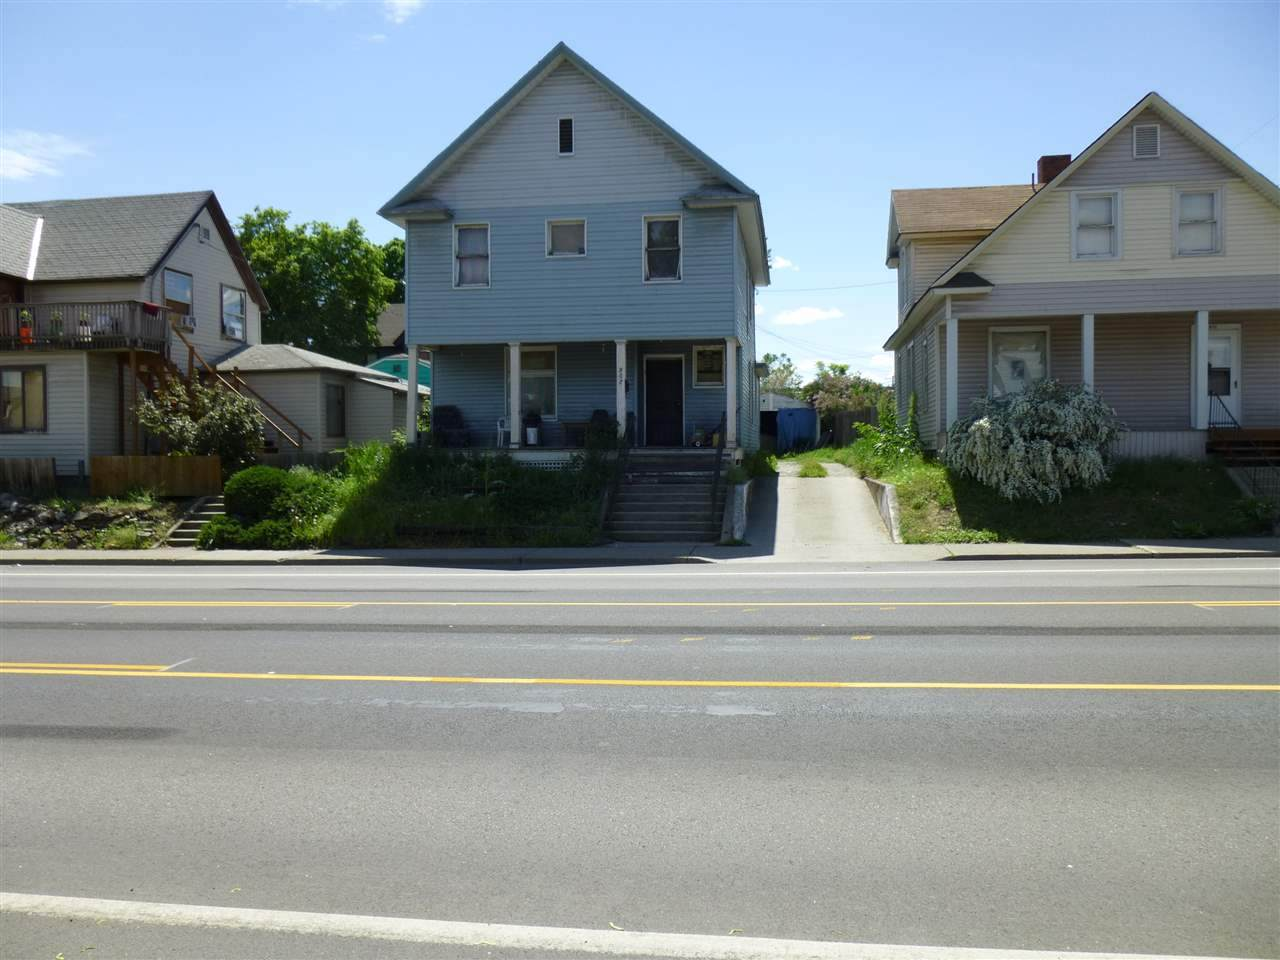 907 Maxwell Ave - Photo 1